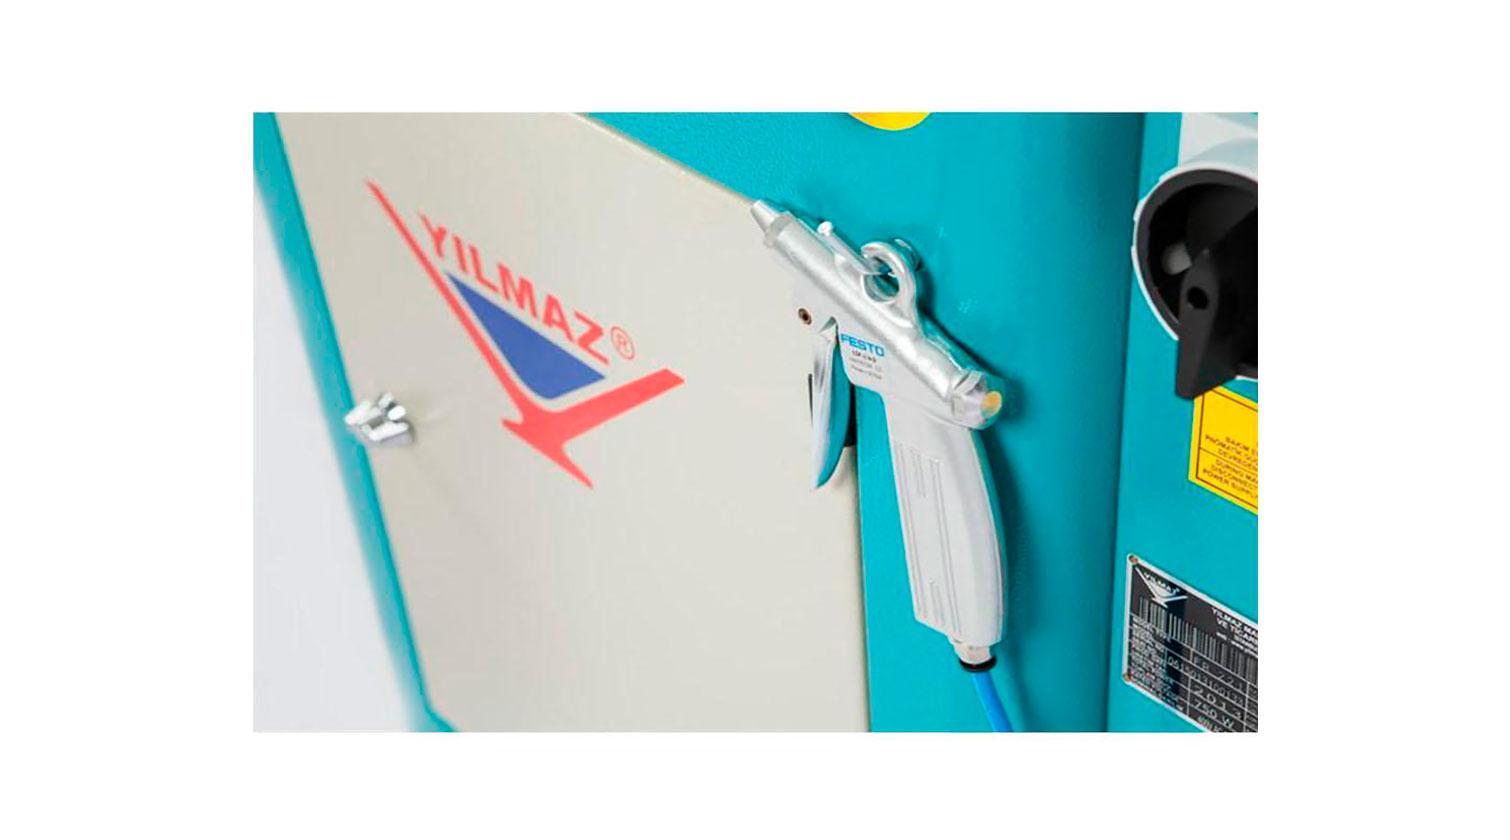 INT aluminum copy router Yilmaz FR 221 S air gun